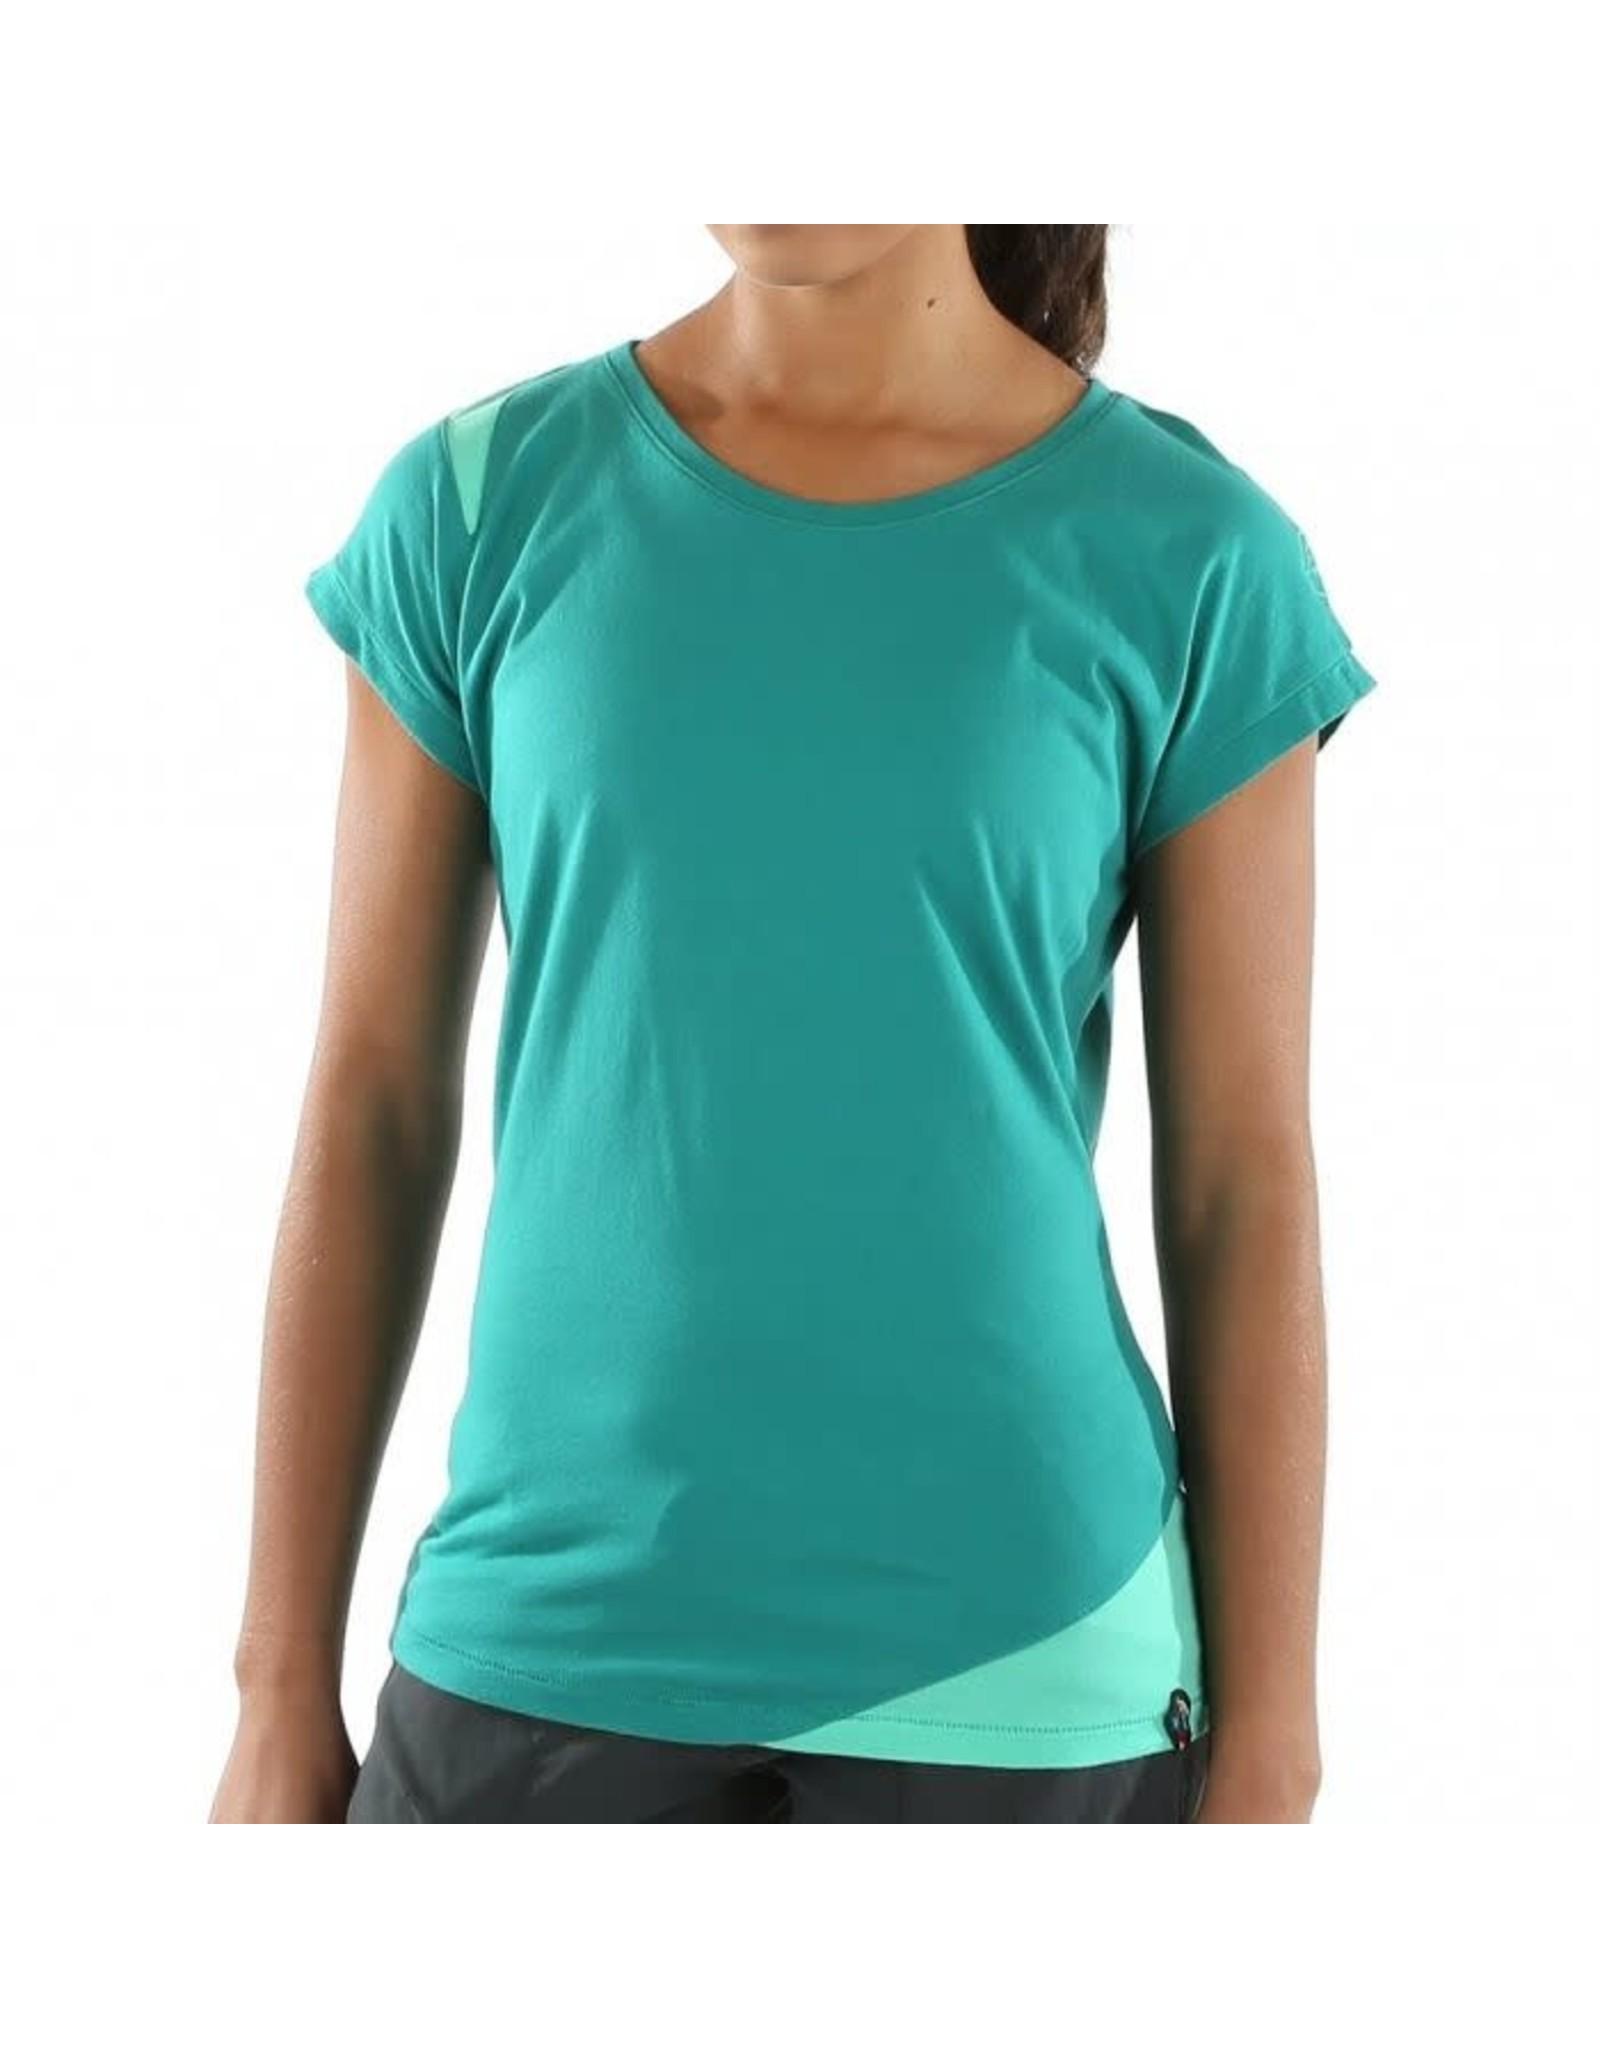 La Sportiva T-shirt La Sportiva Chimney - Femme